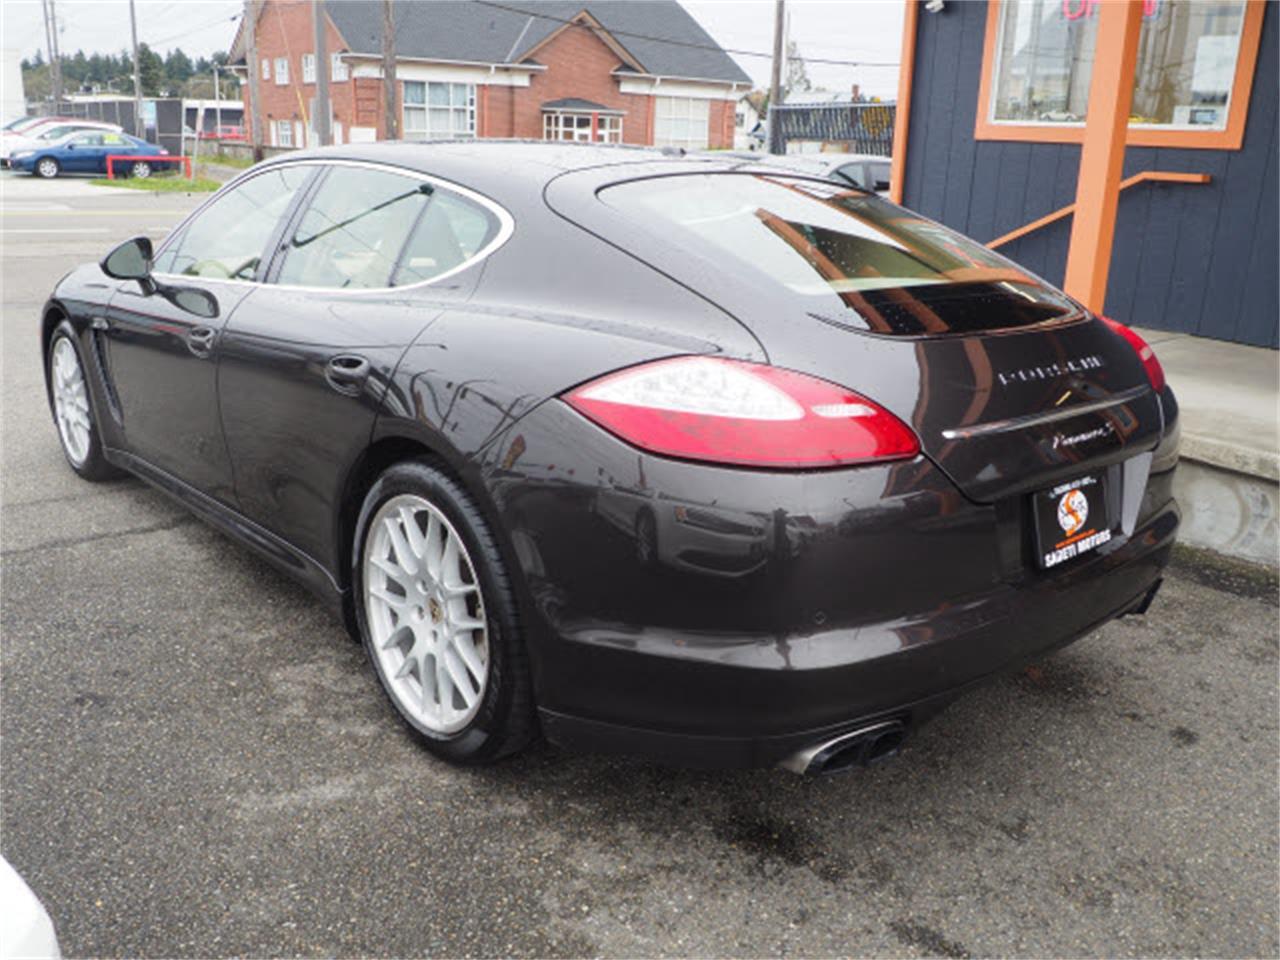 2010 Porsche Panamera (CC-1417013) for sale in Tacoma, Washington